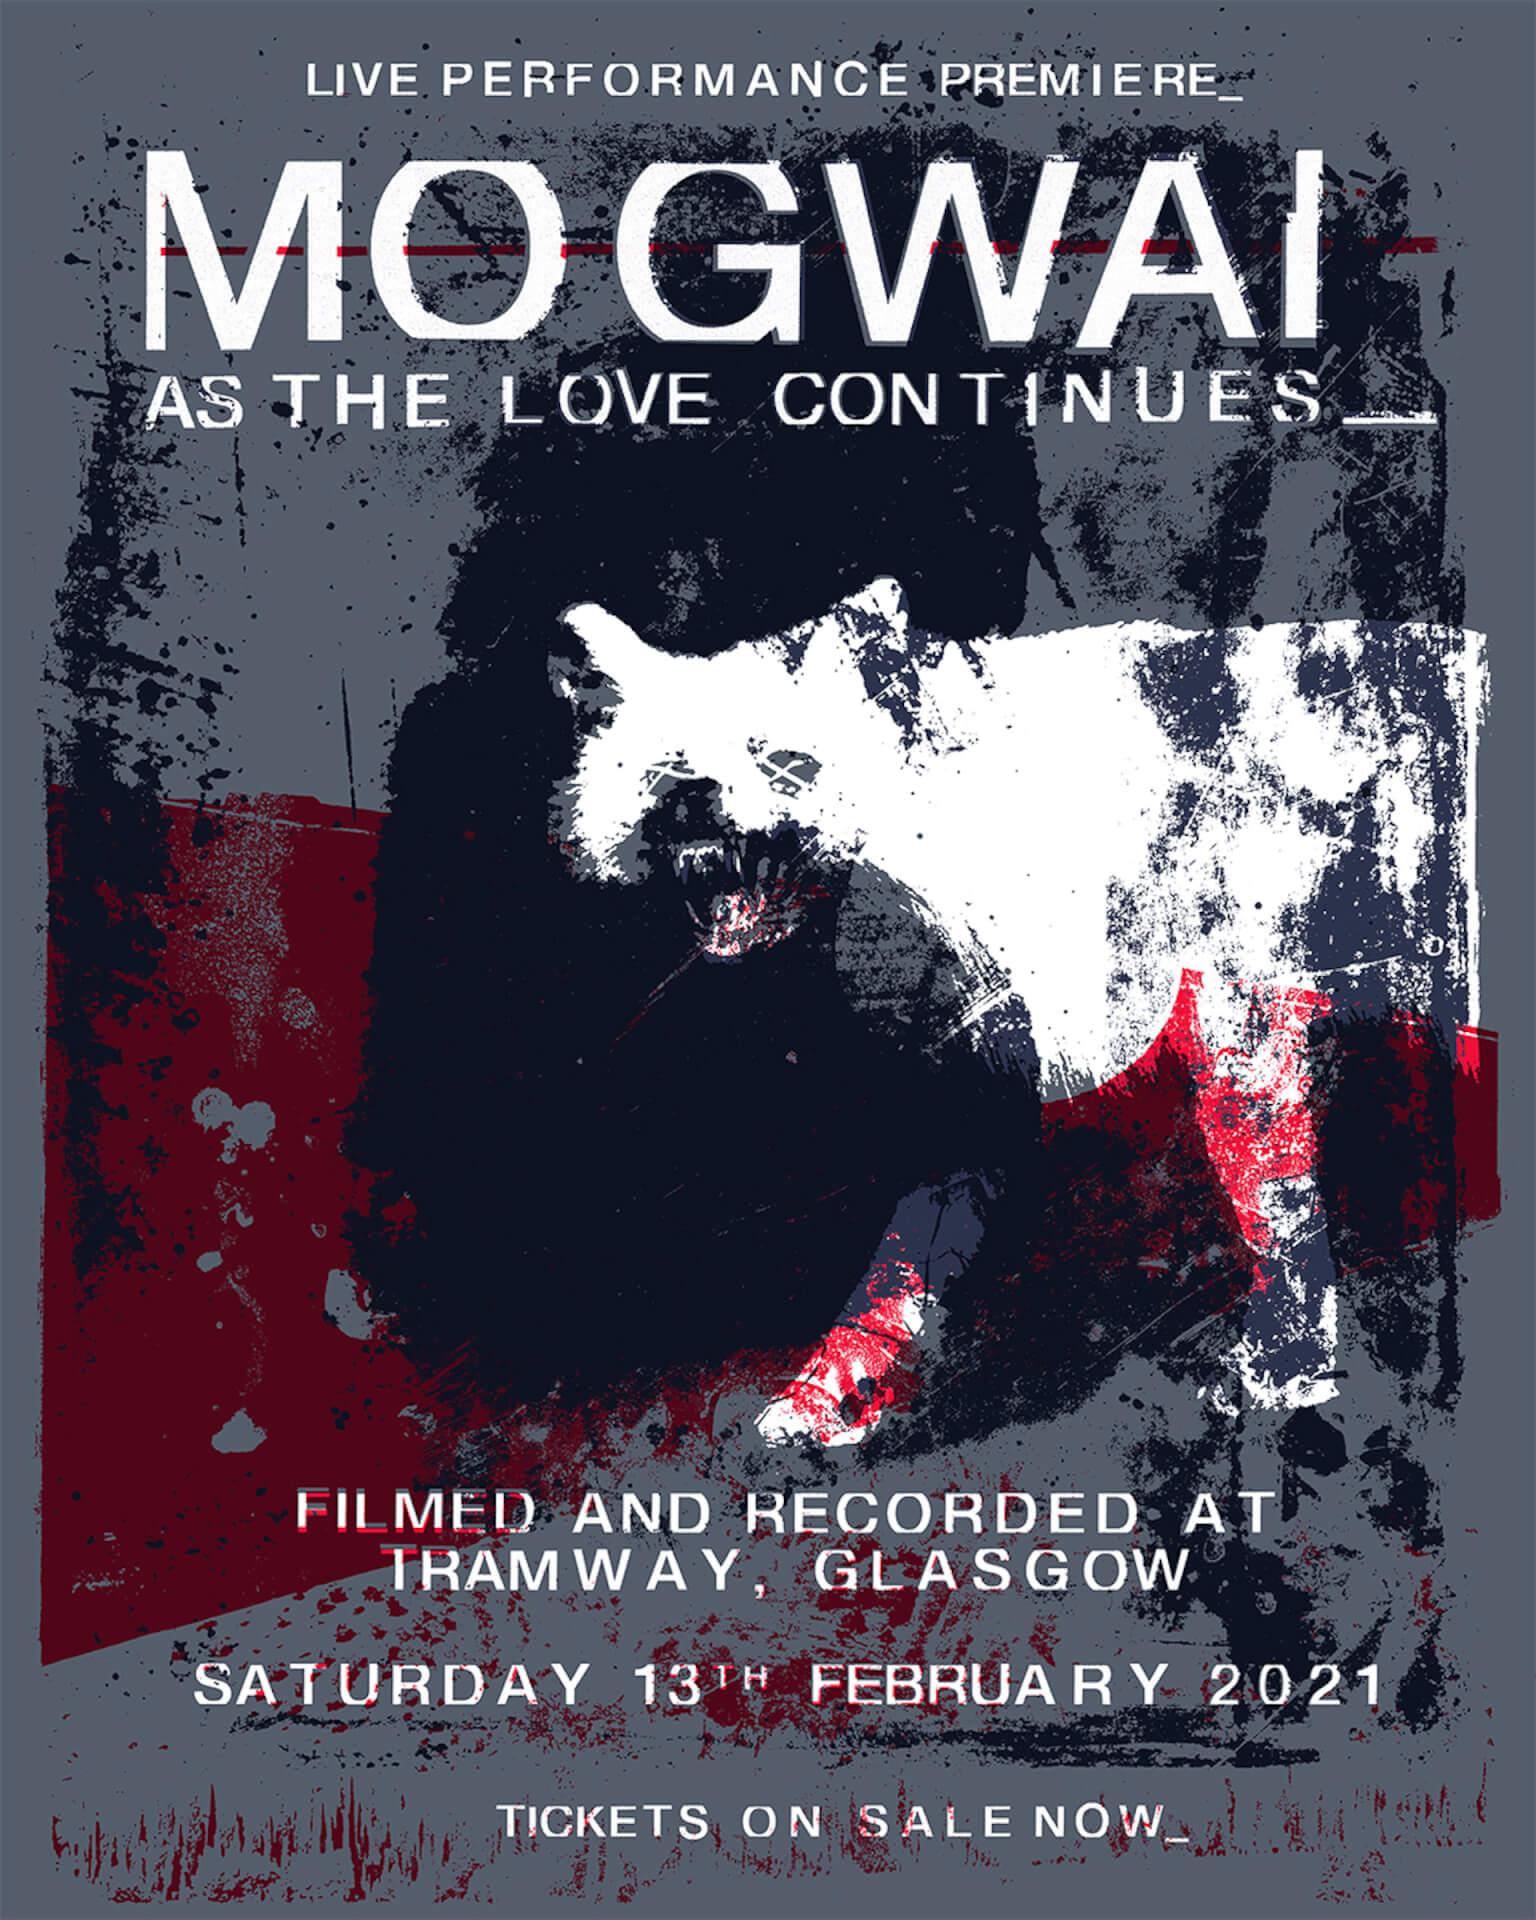 Mogwaiの3年半ぶりのニューアルバム『As The Love Continues』がリリース決定!先行配信曲のMVも公開 music210113_mogwai-01